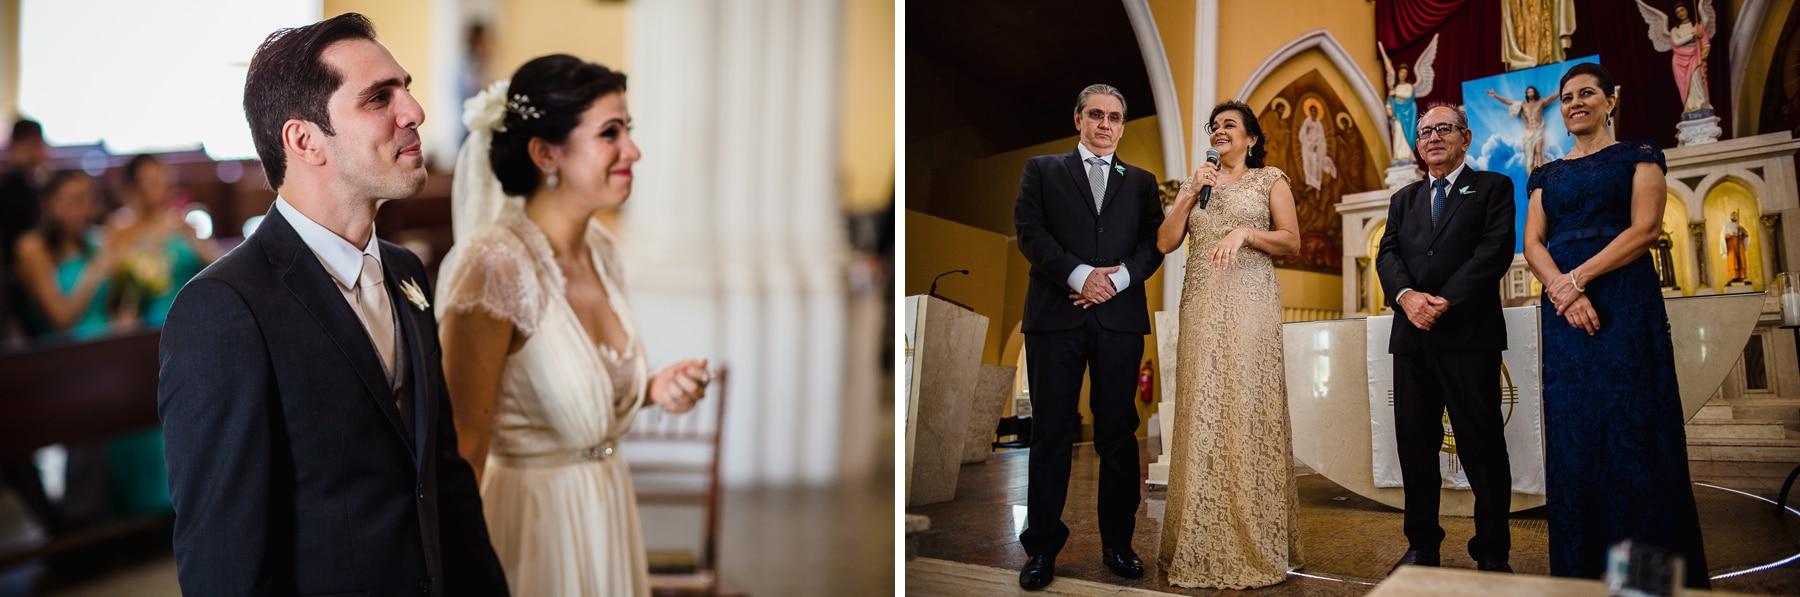 casamento-igreja-do-cristo-rei-fortaleza-30